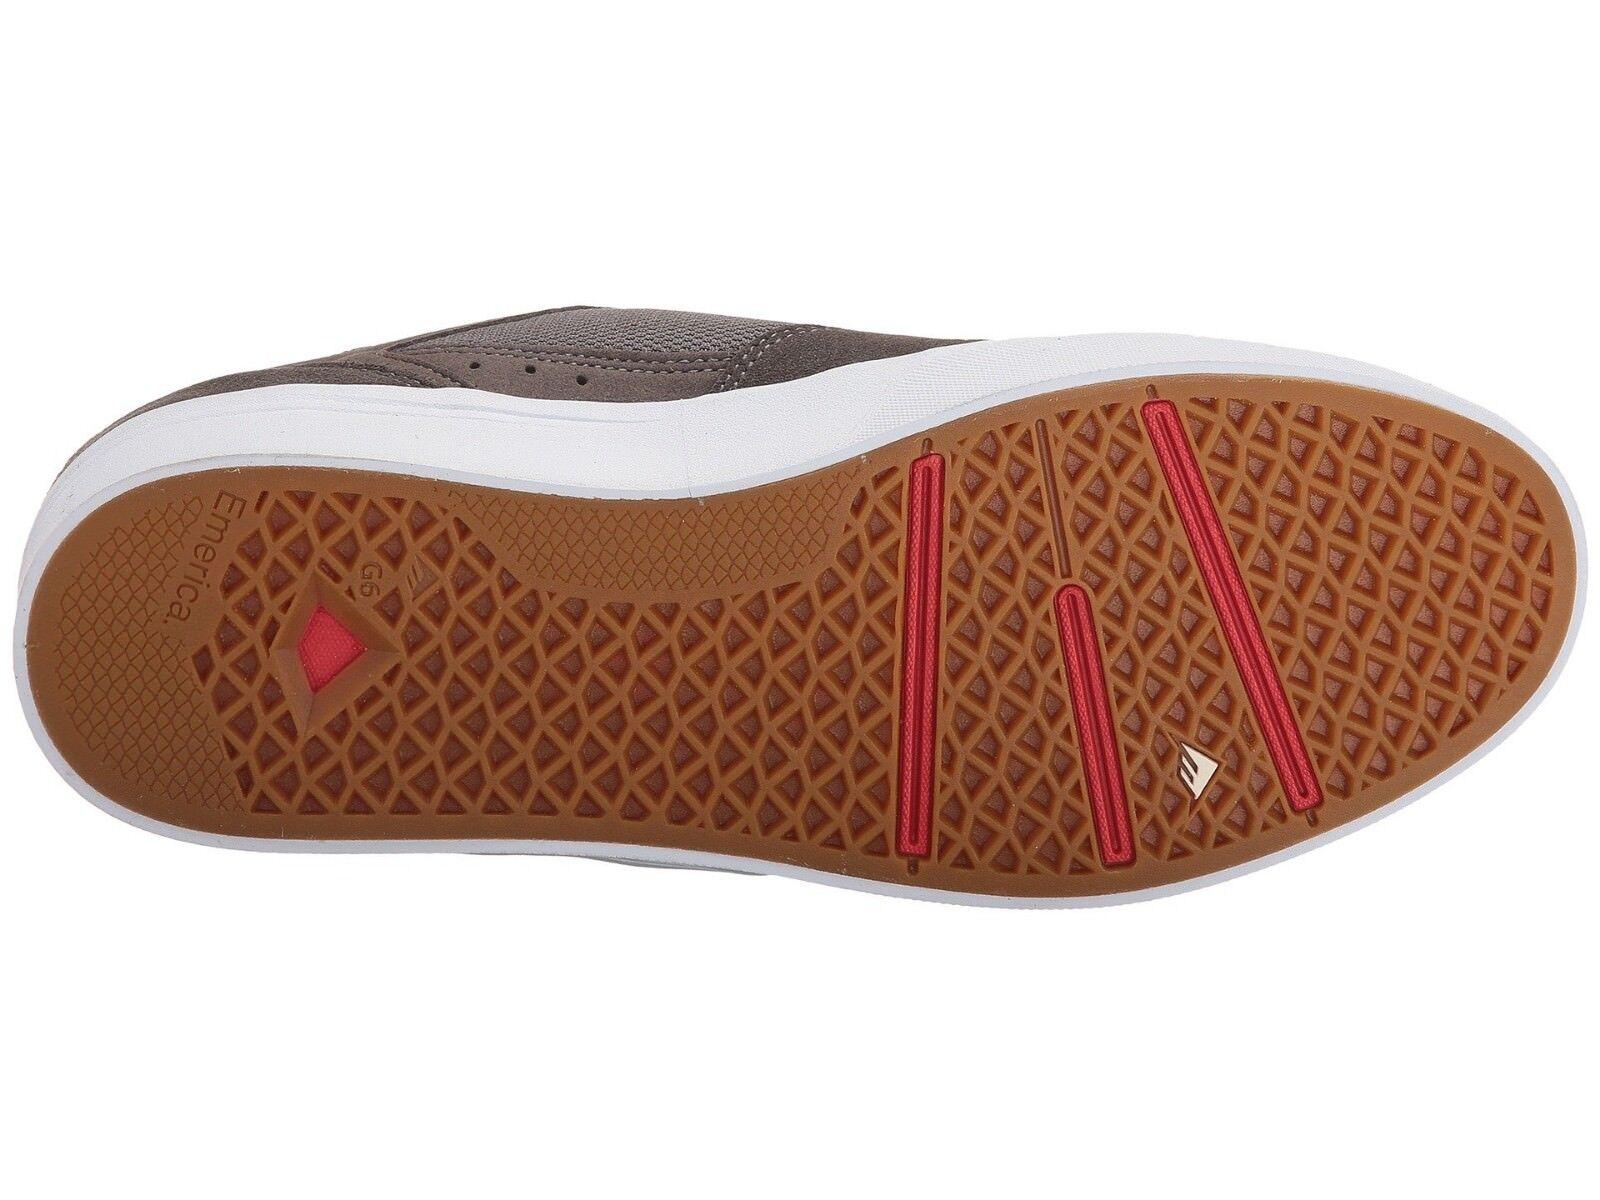 mens schuhe emerica empire g6 skateboard - schuhe mens für grau - weiß 636bba